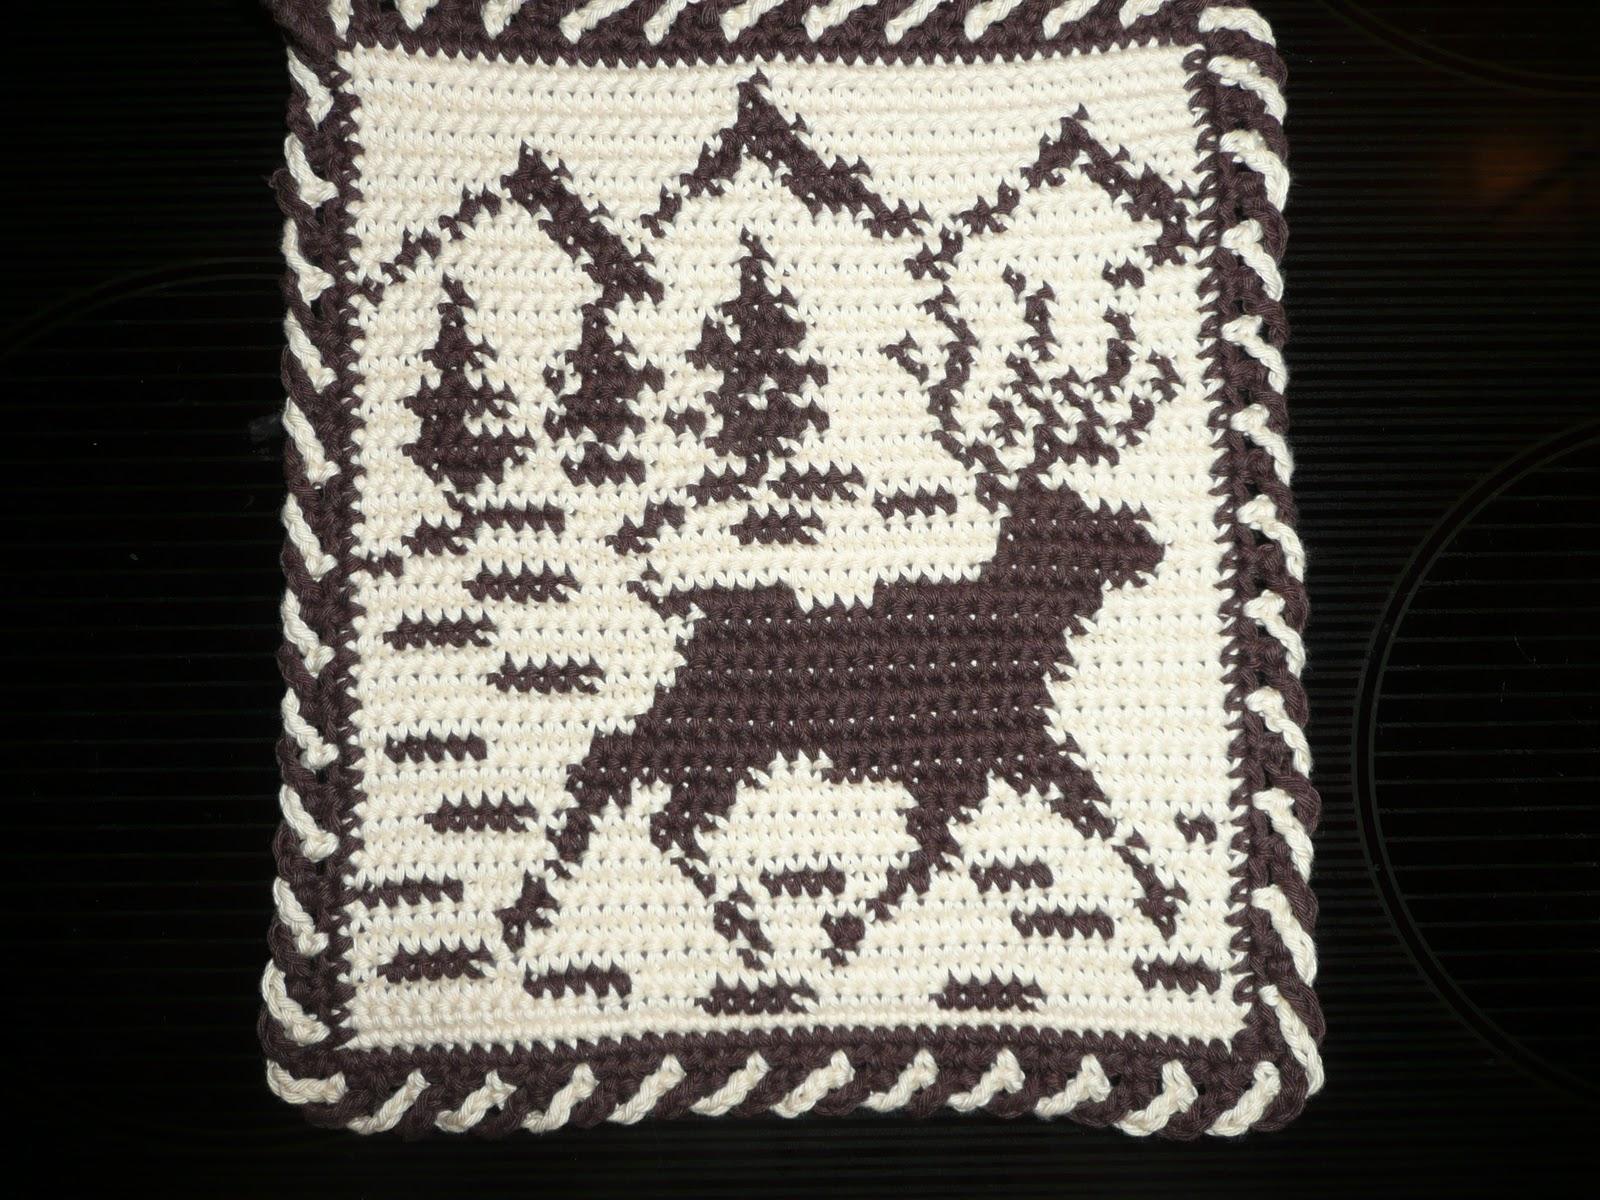 Famous Häkeln Tiere Muster Mold - Decke Stricken Muster ...